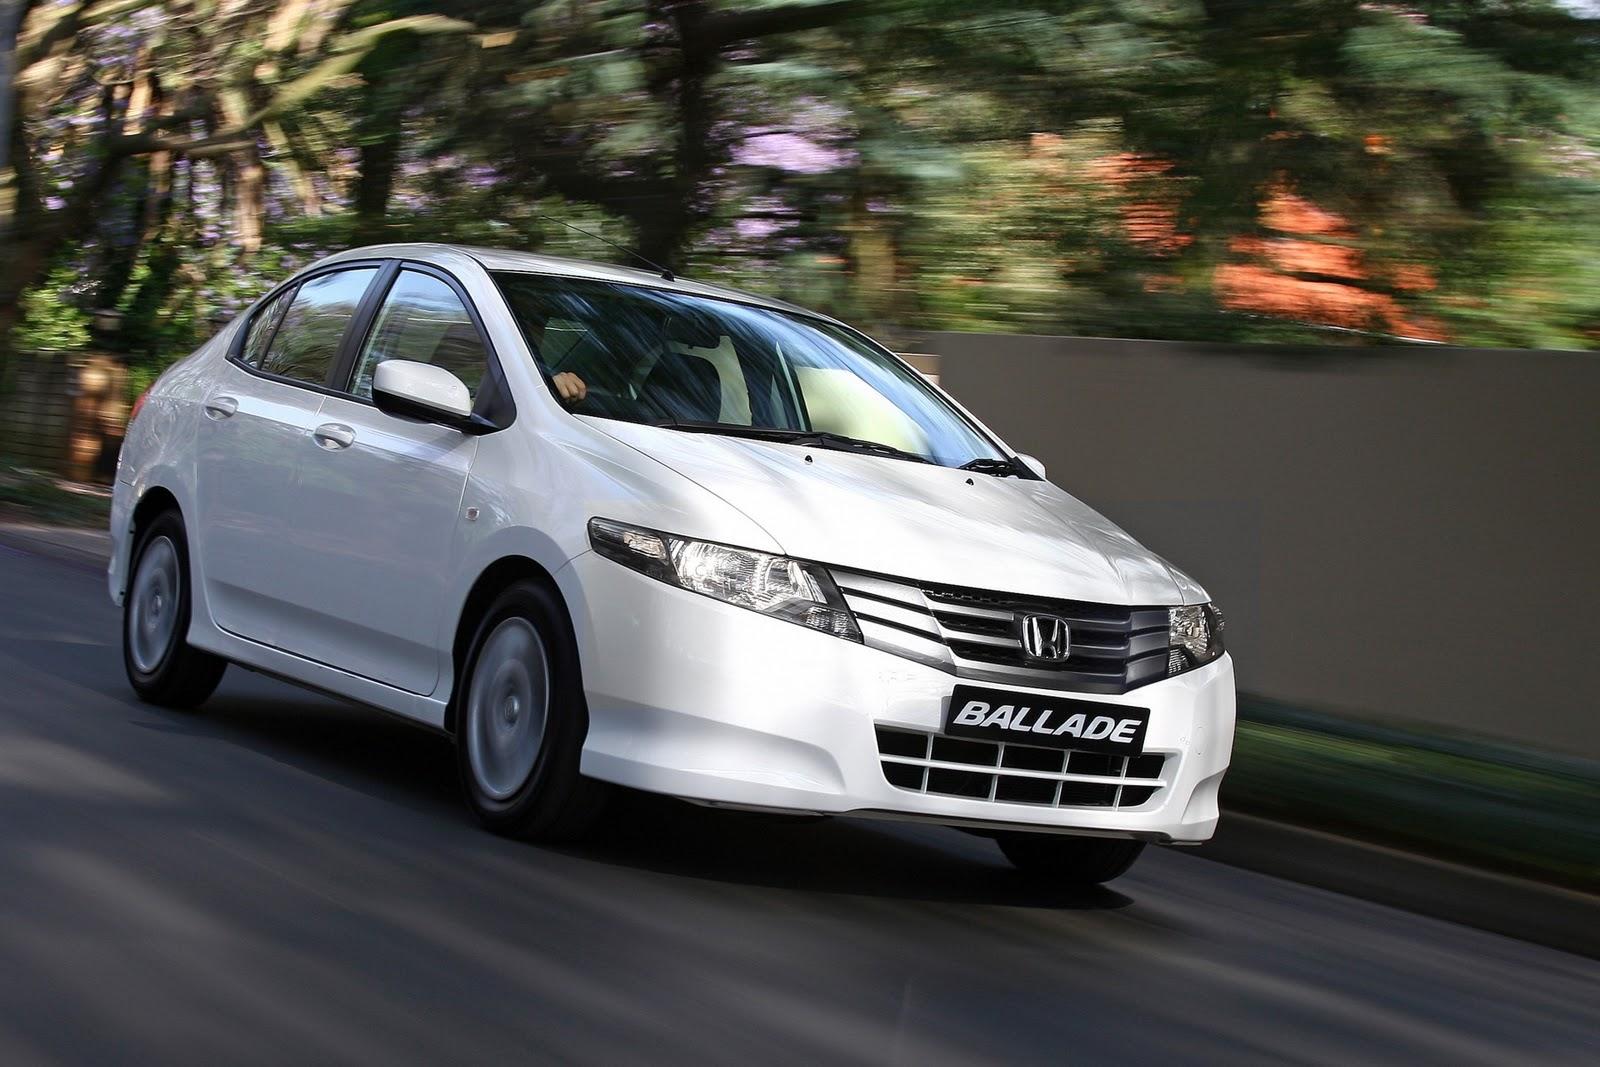 In4ride Honda Ballade Returning To South Africa